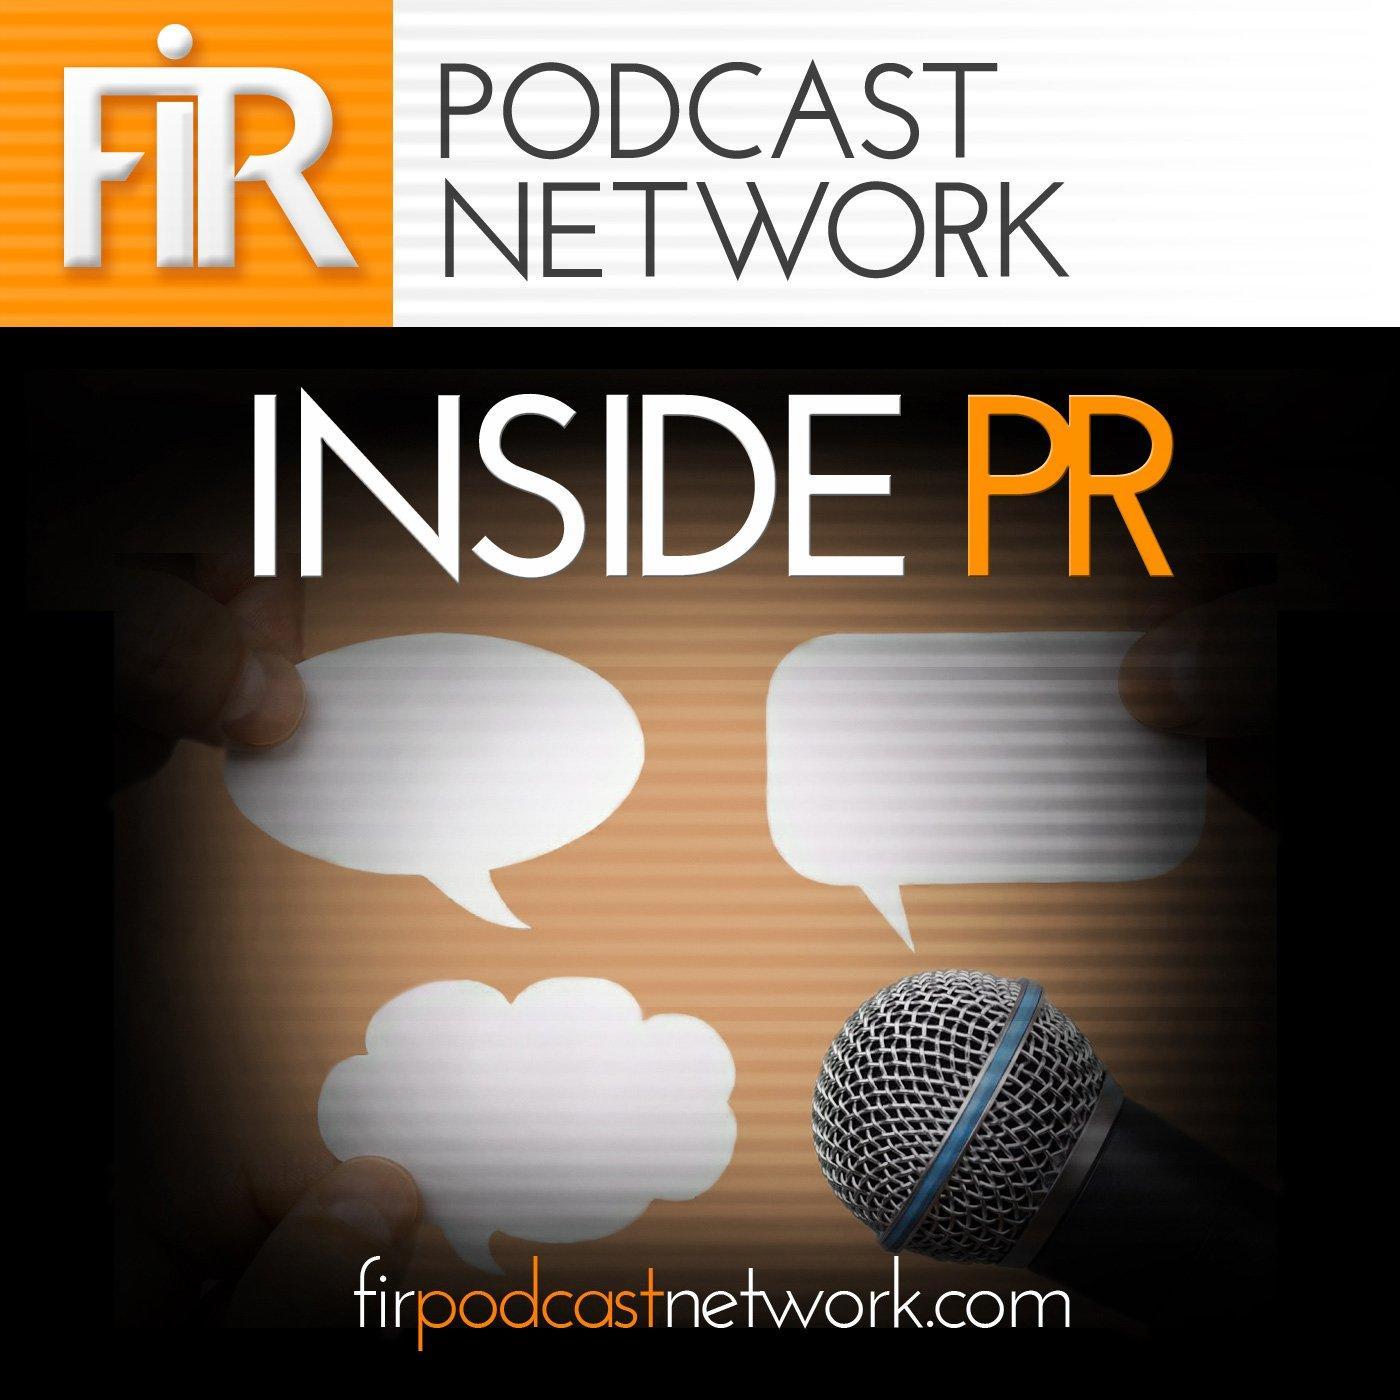 Inside PR 448: Integrate This!